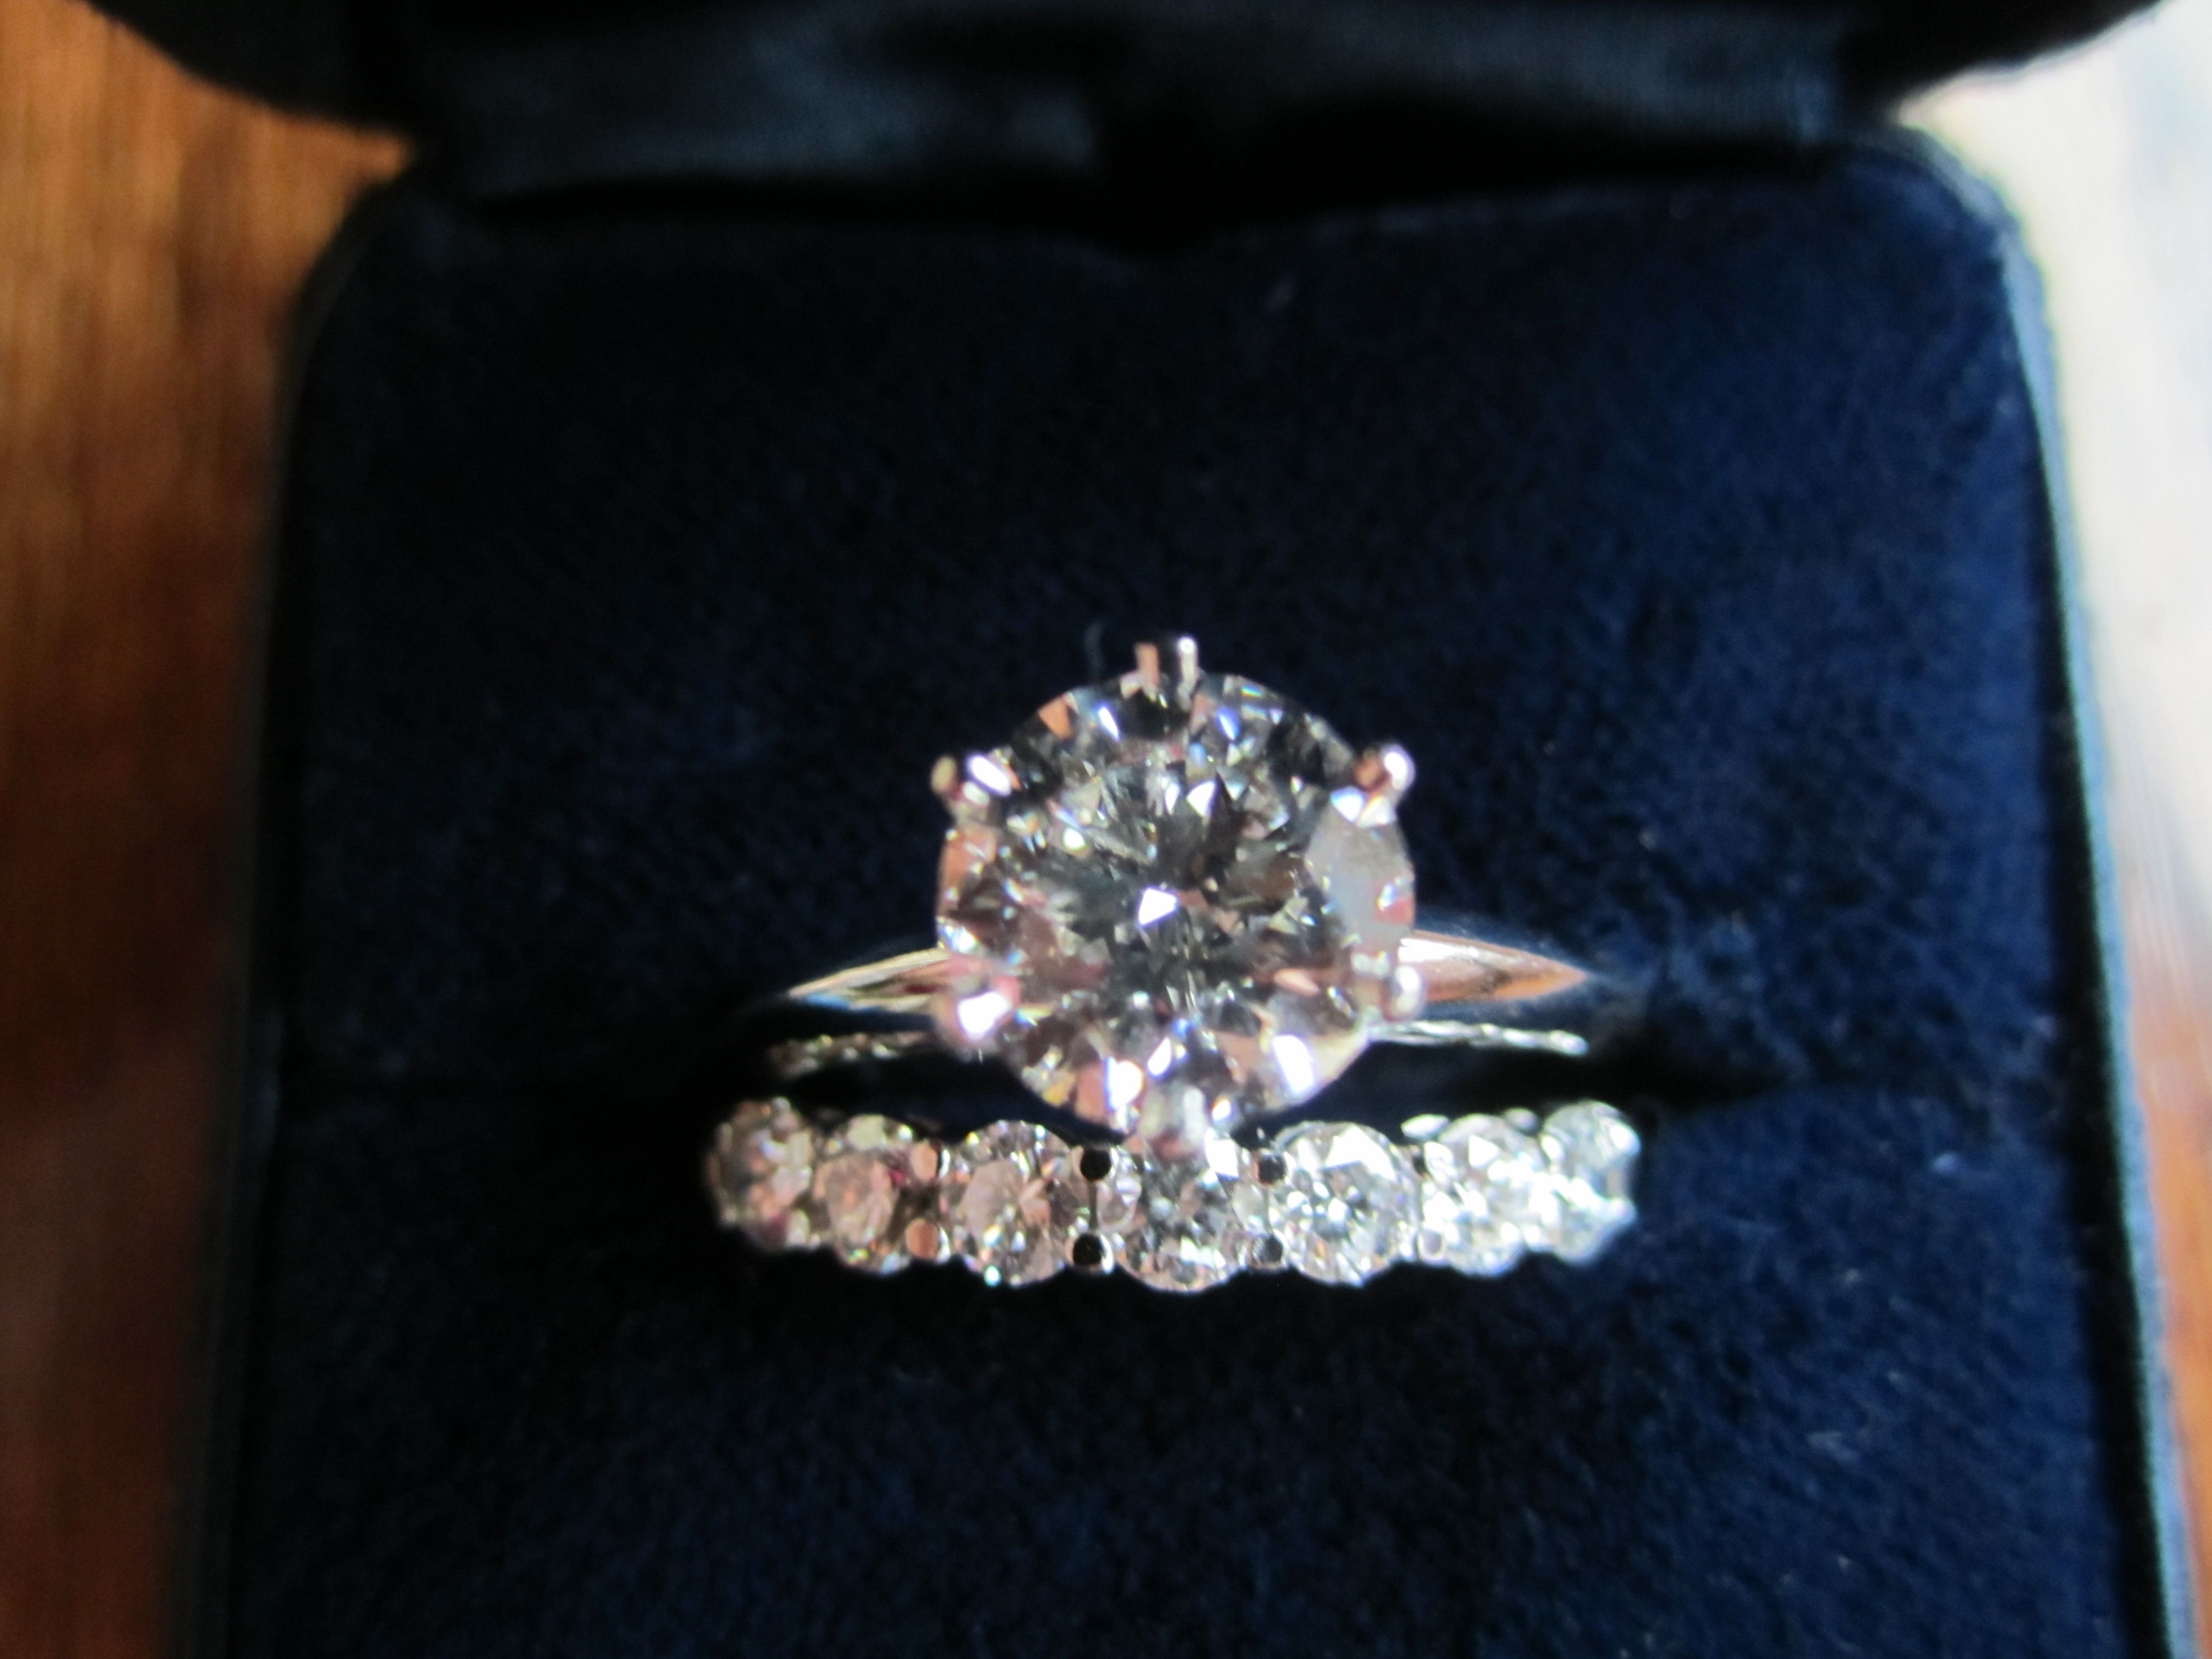 tiffany setting engagement round diamond wedding rings tiffany band engagement ring brilliant diamond wedding Band only Engagement ring